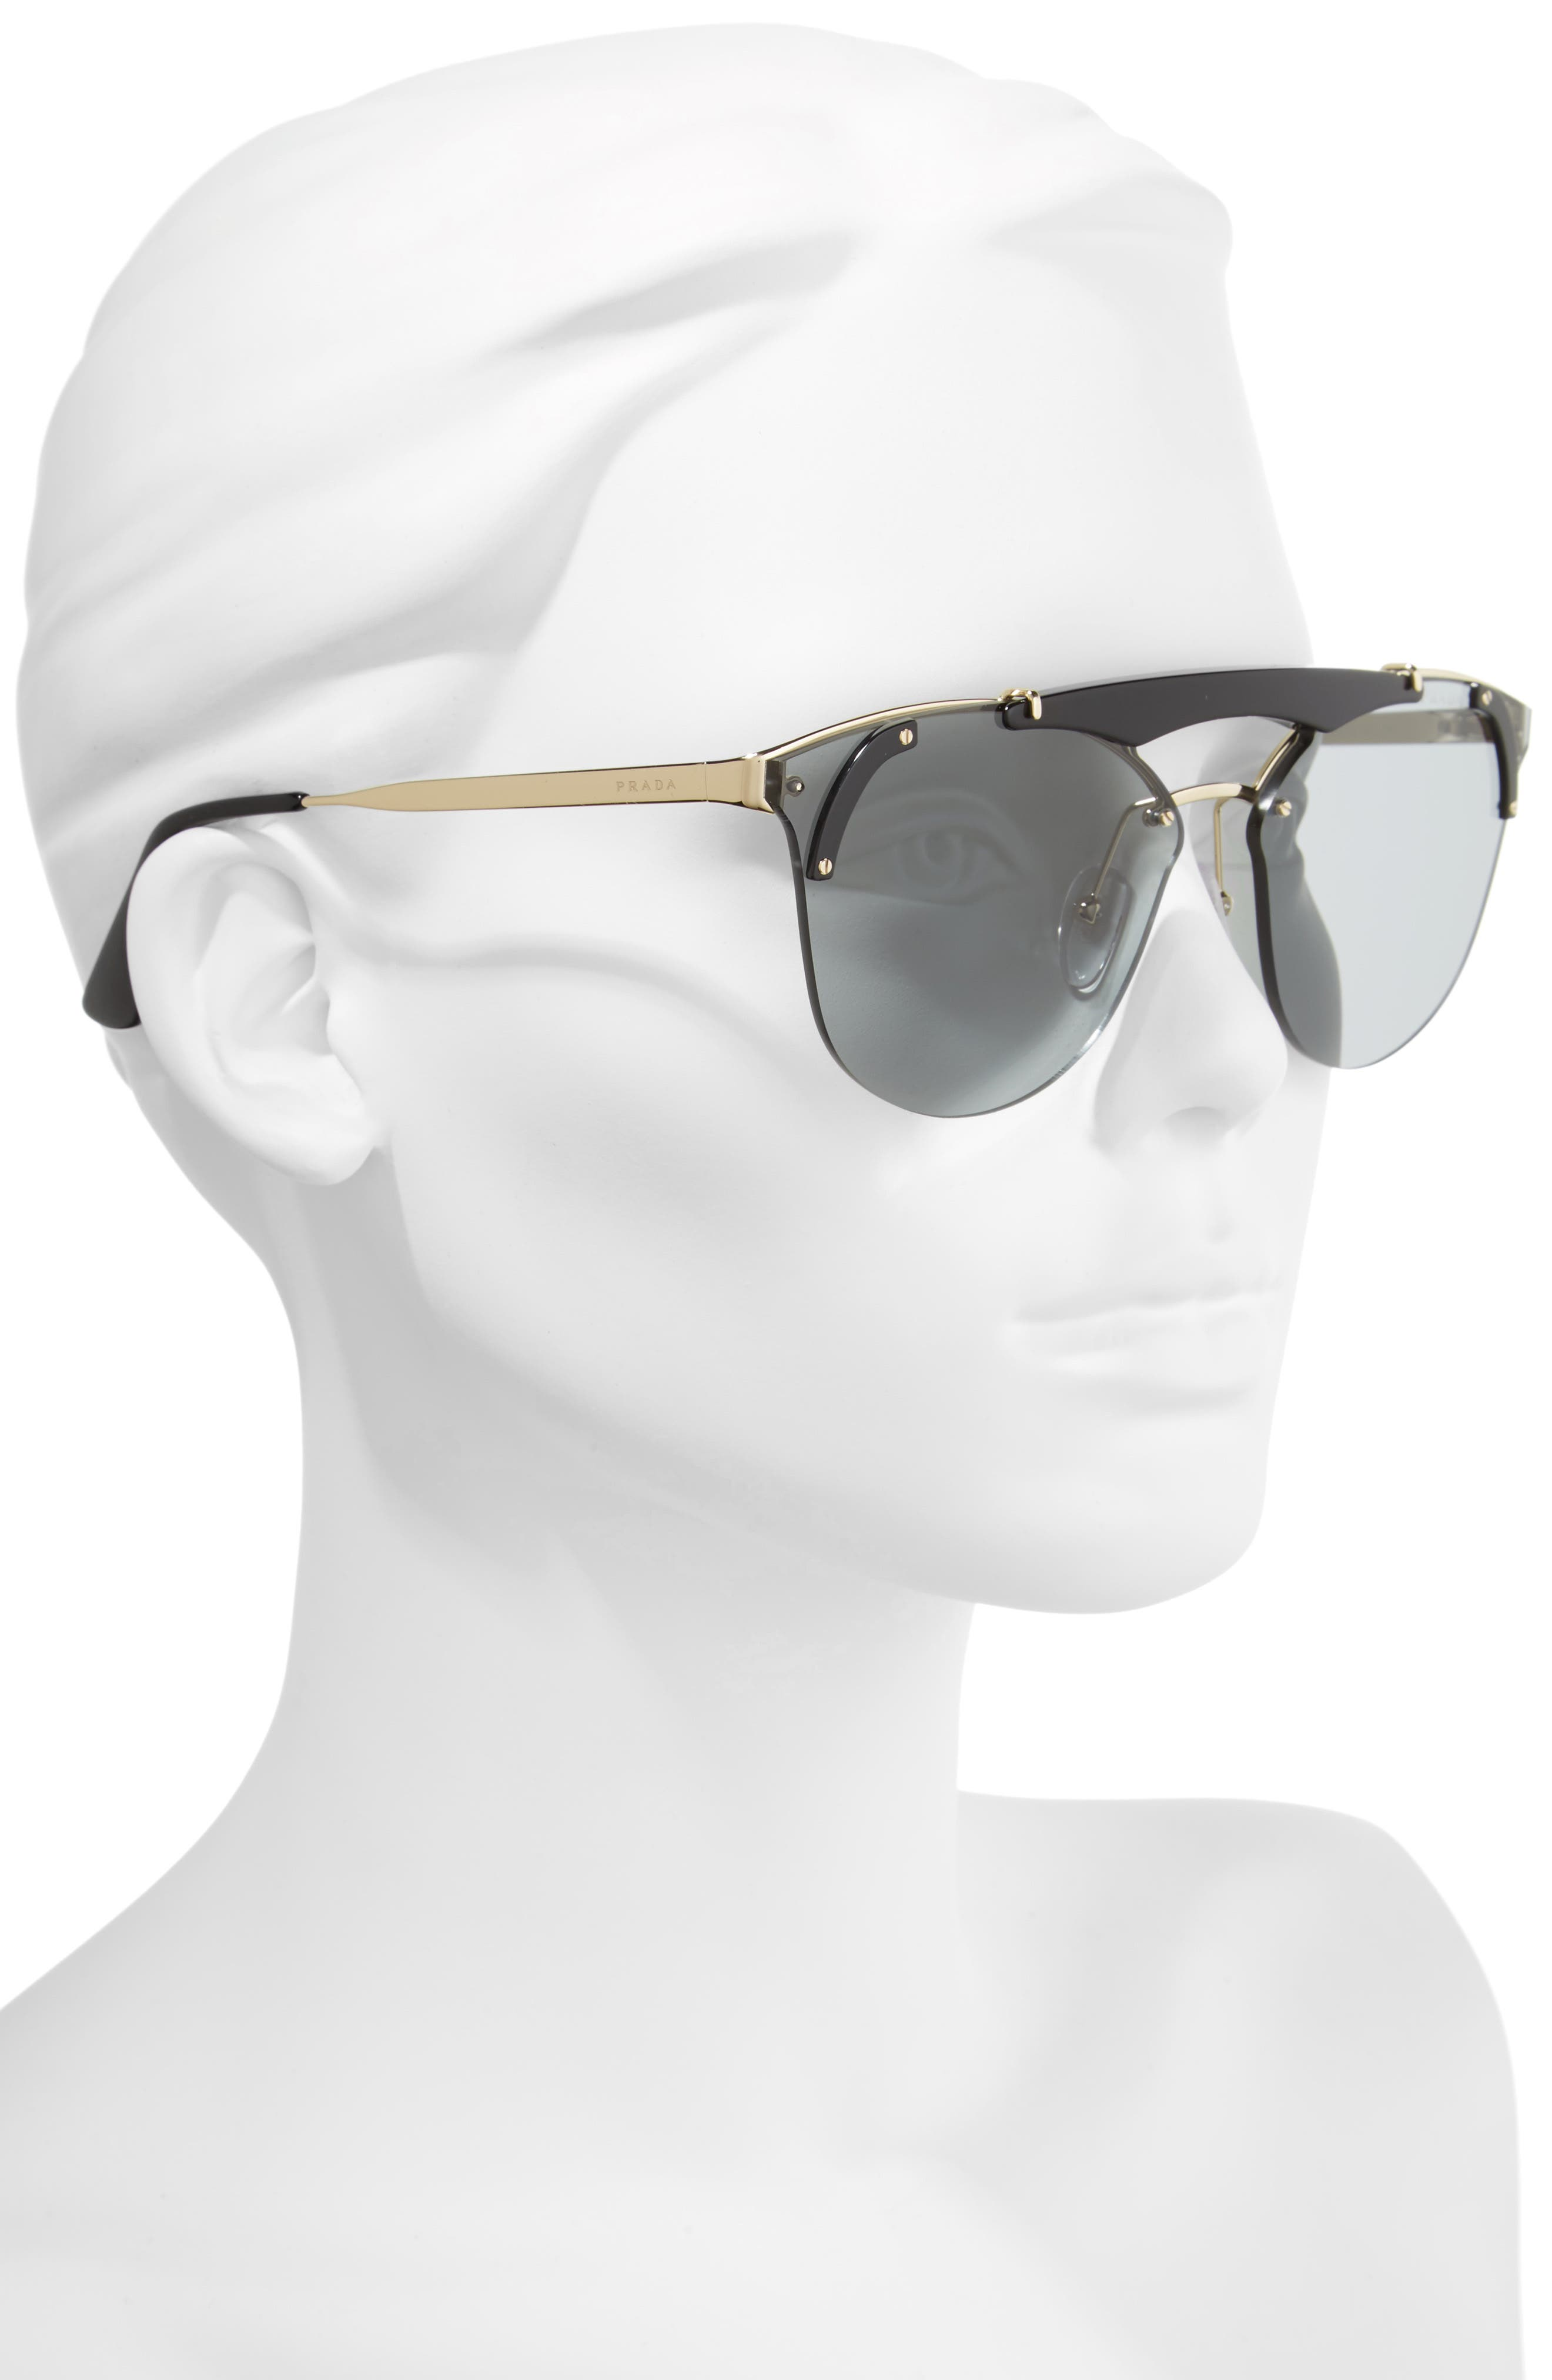 53mm Round Sunglasses,                             Alternate thumbnail 3, color,                             710